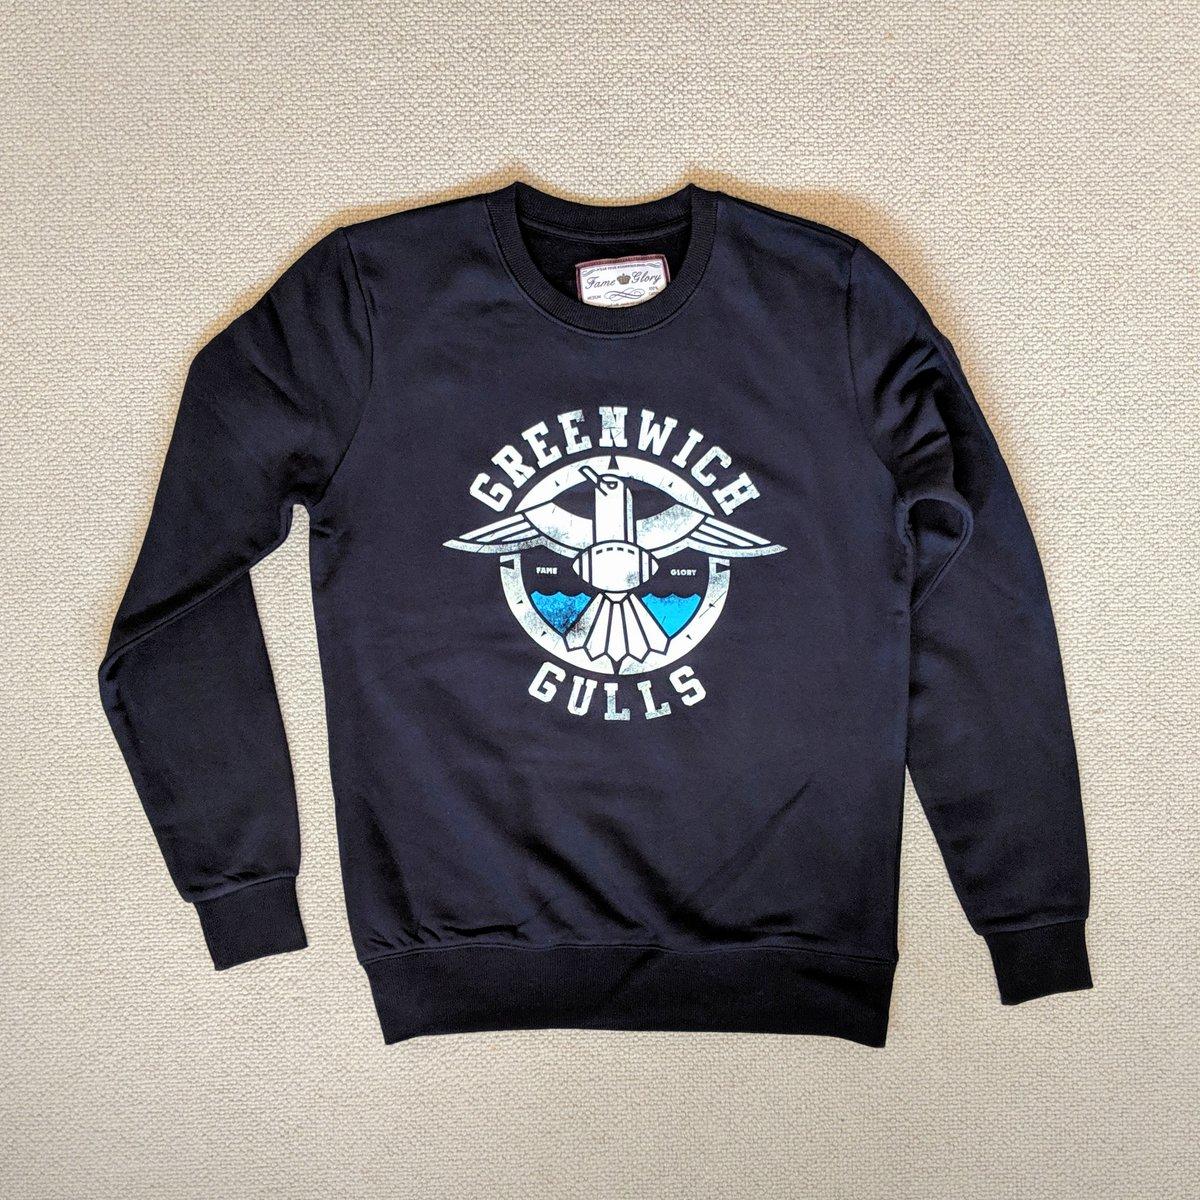 Image of Greenwich Gulls - Navy Sweater